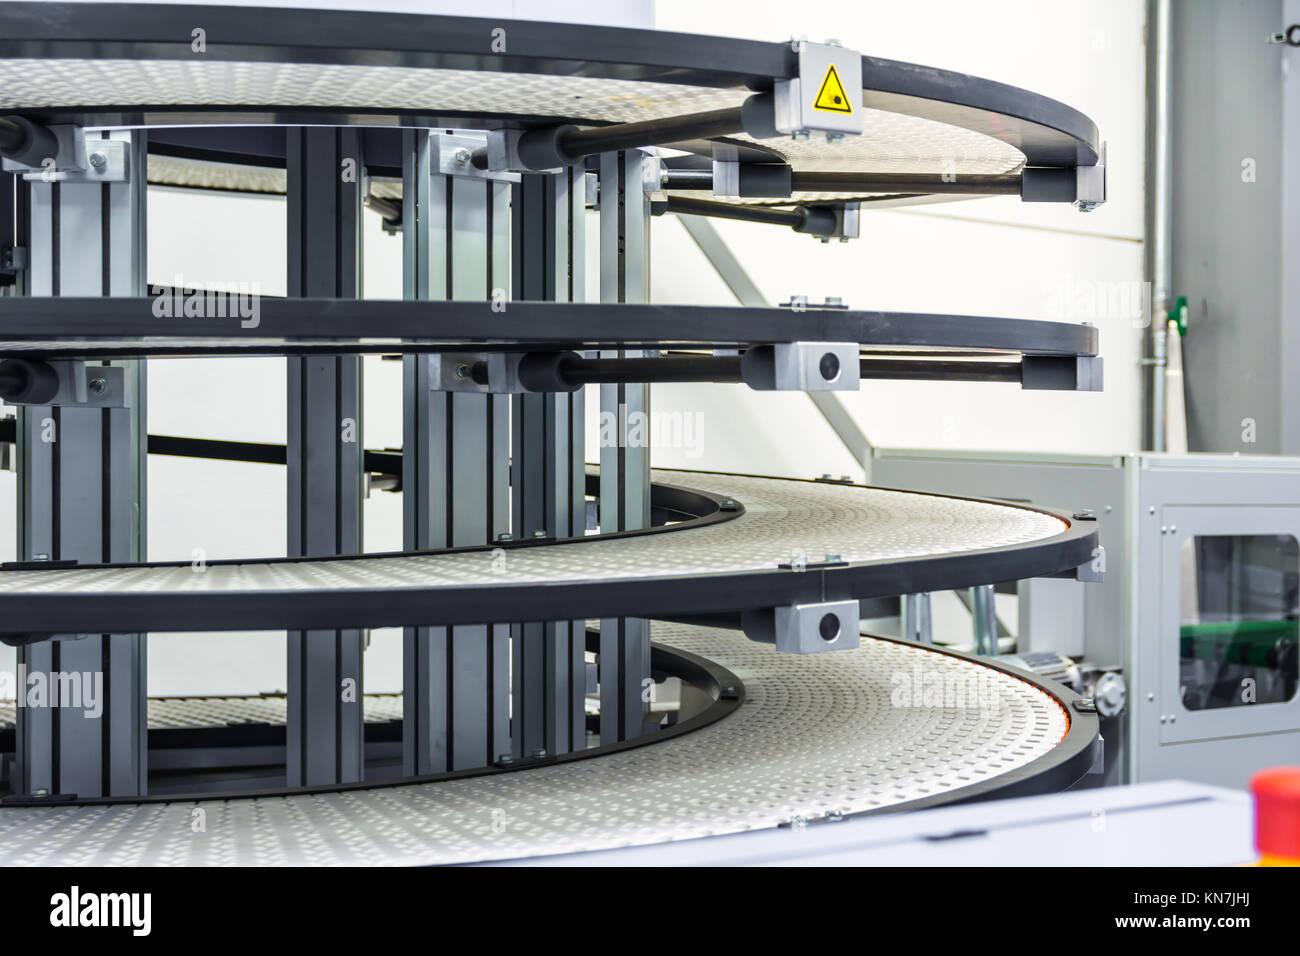 Factory Conveyor Belt Spiral Transportation Empty Idle Company Industrail Machine Book FInishing Line - Stock Image